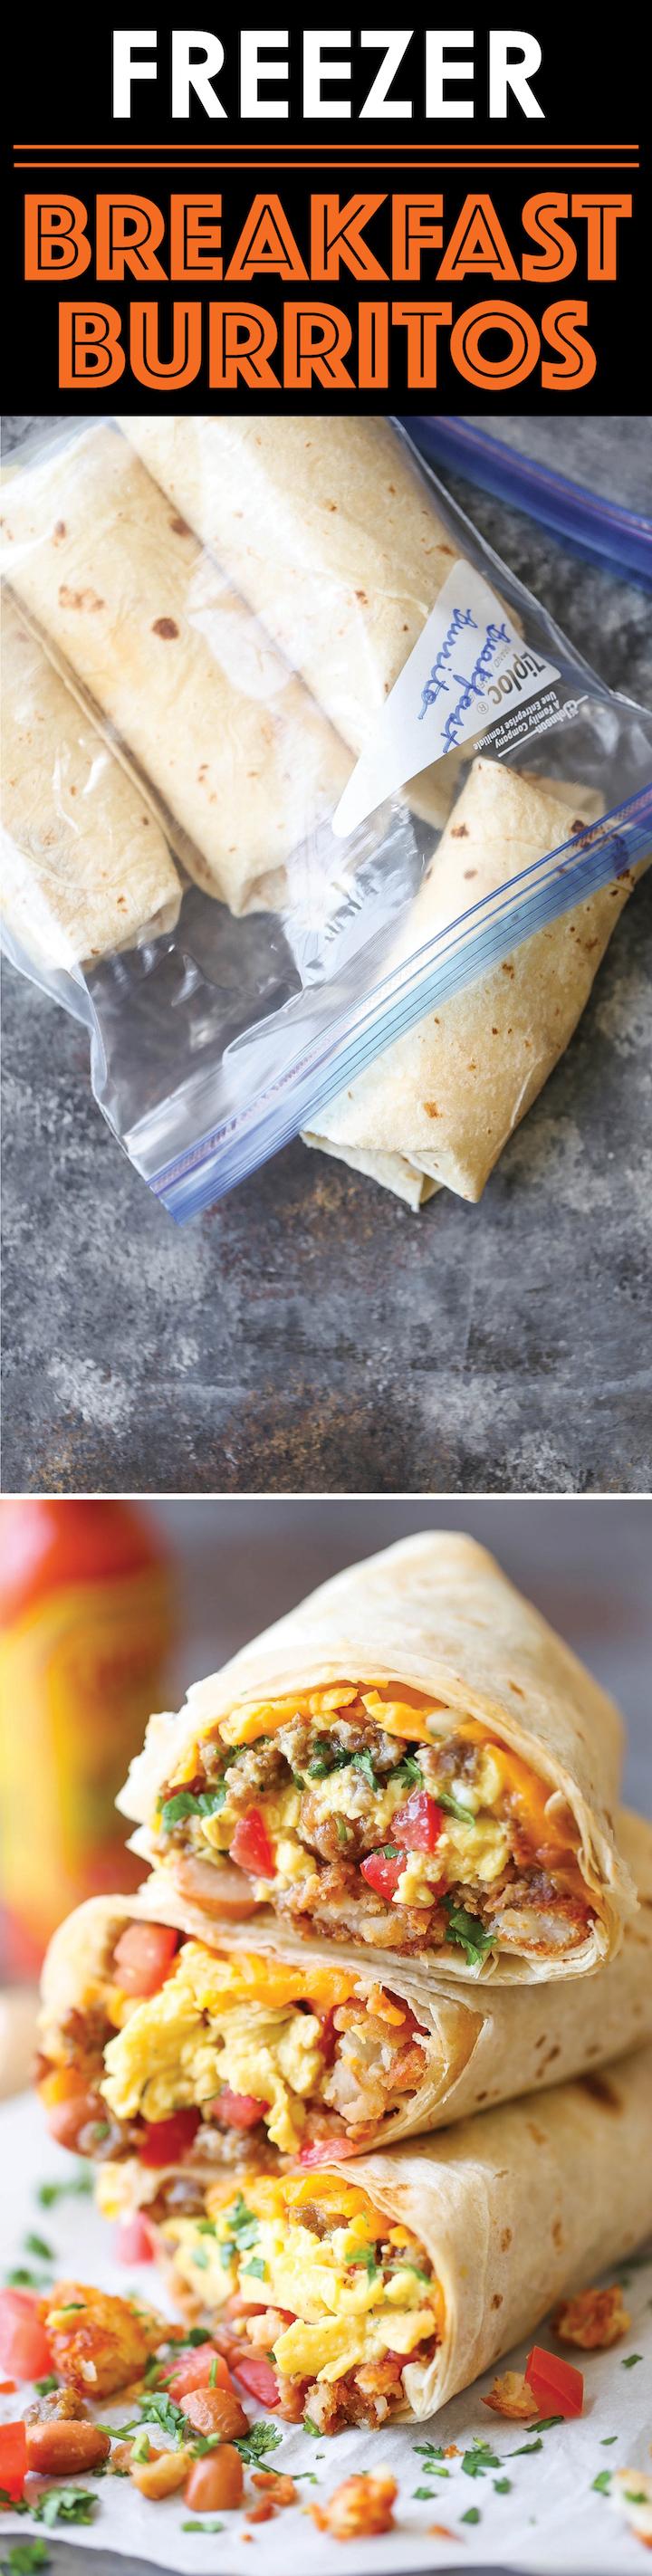 Freezer Breakfast Burritos